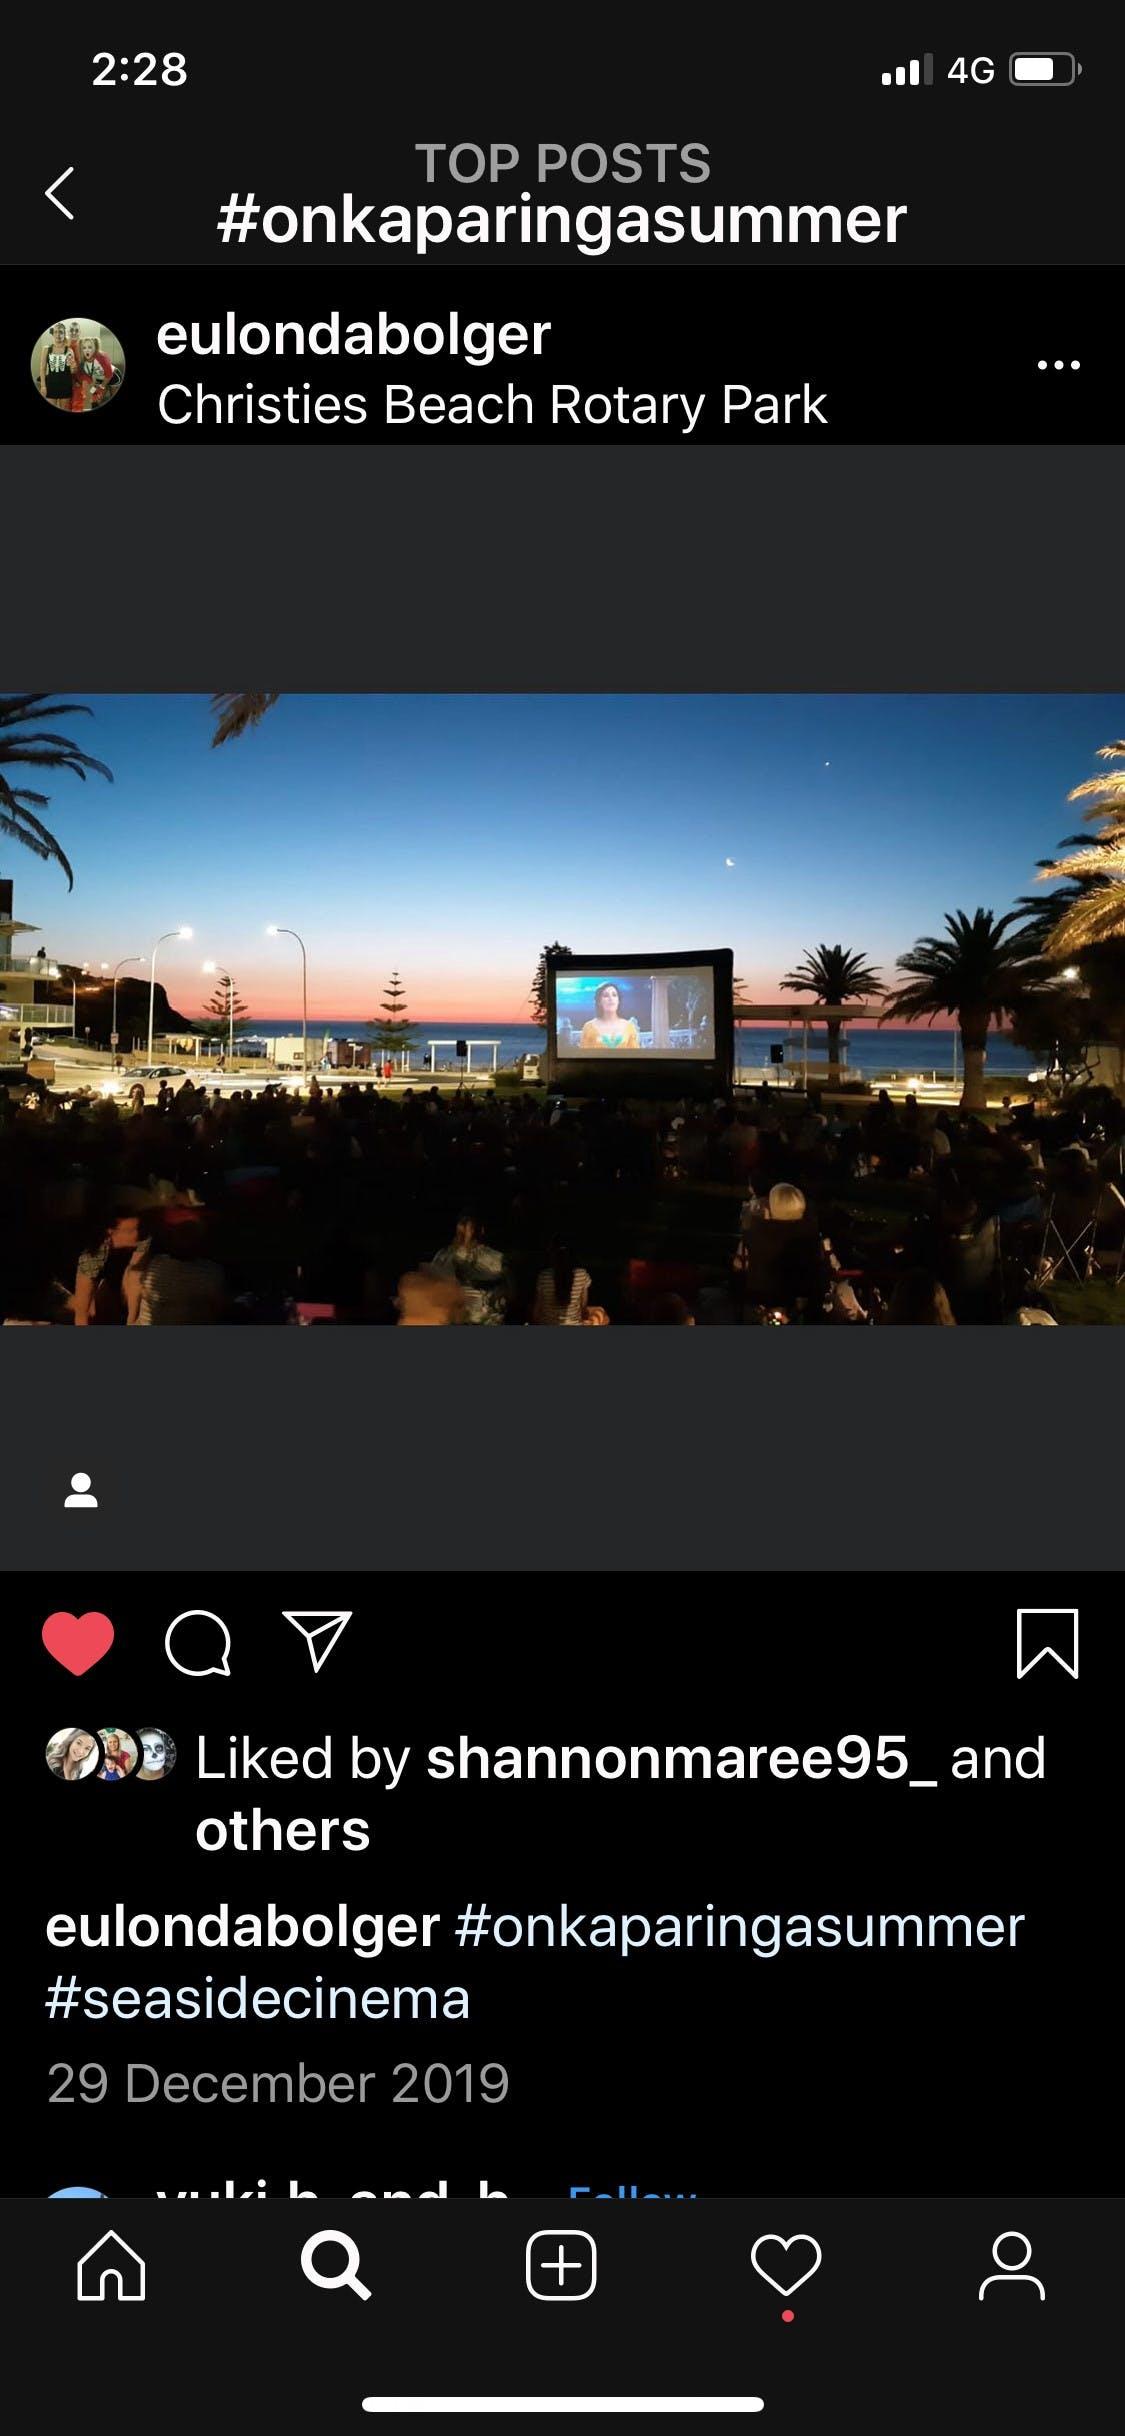 Seaside Cinema Rotary Park 28 December 2019 Aladdin Movie